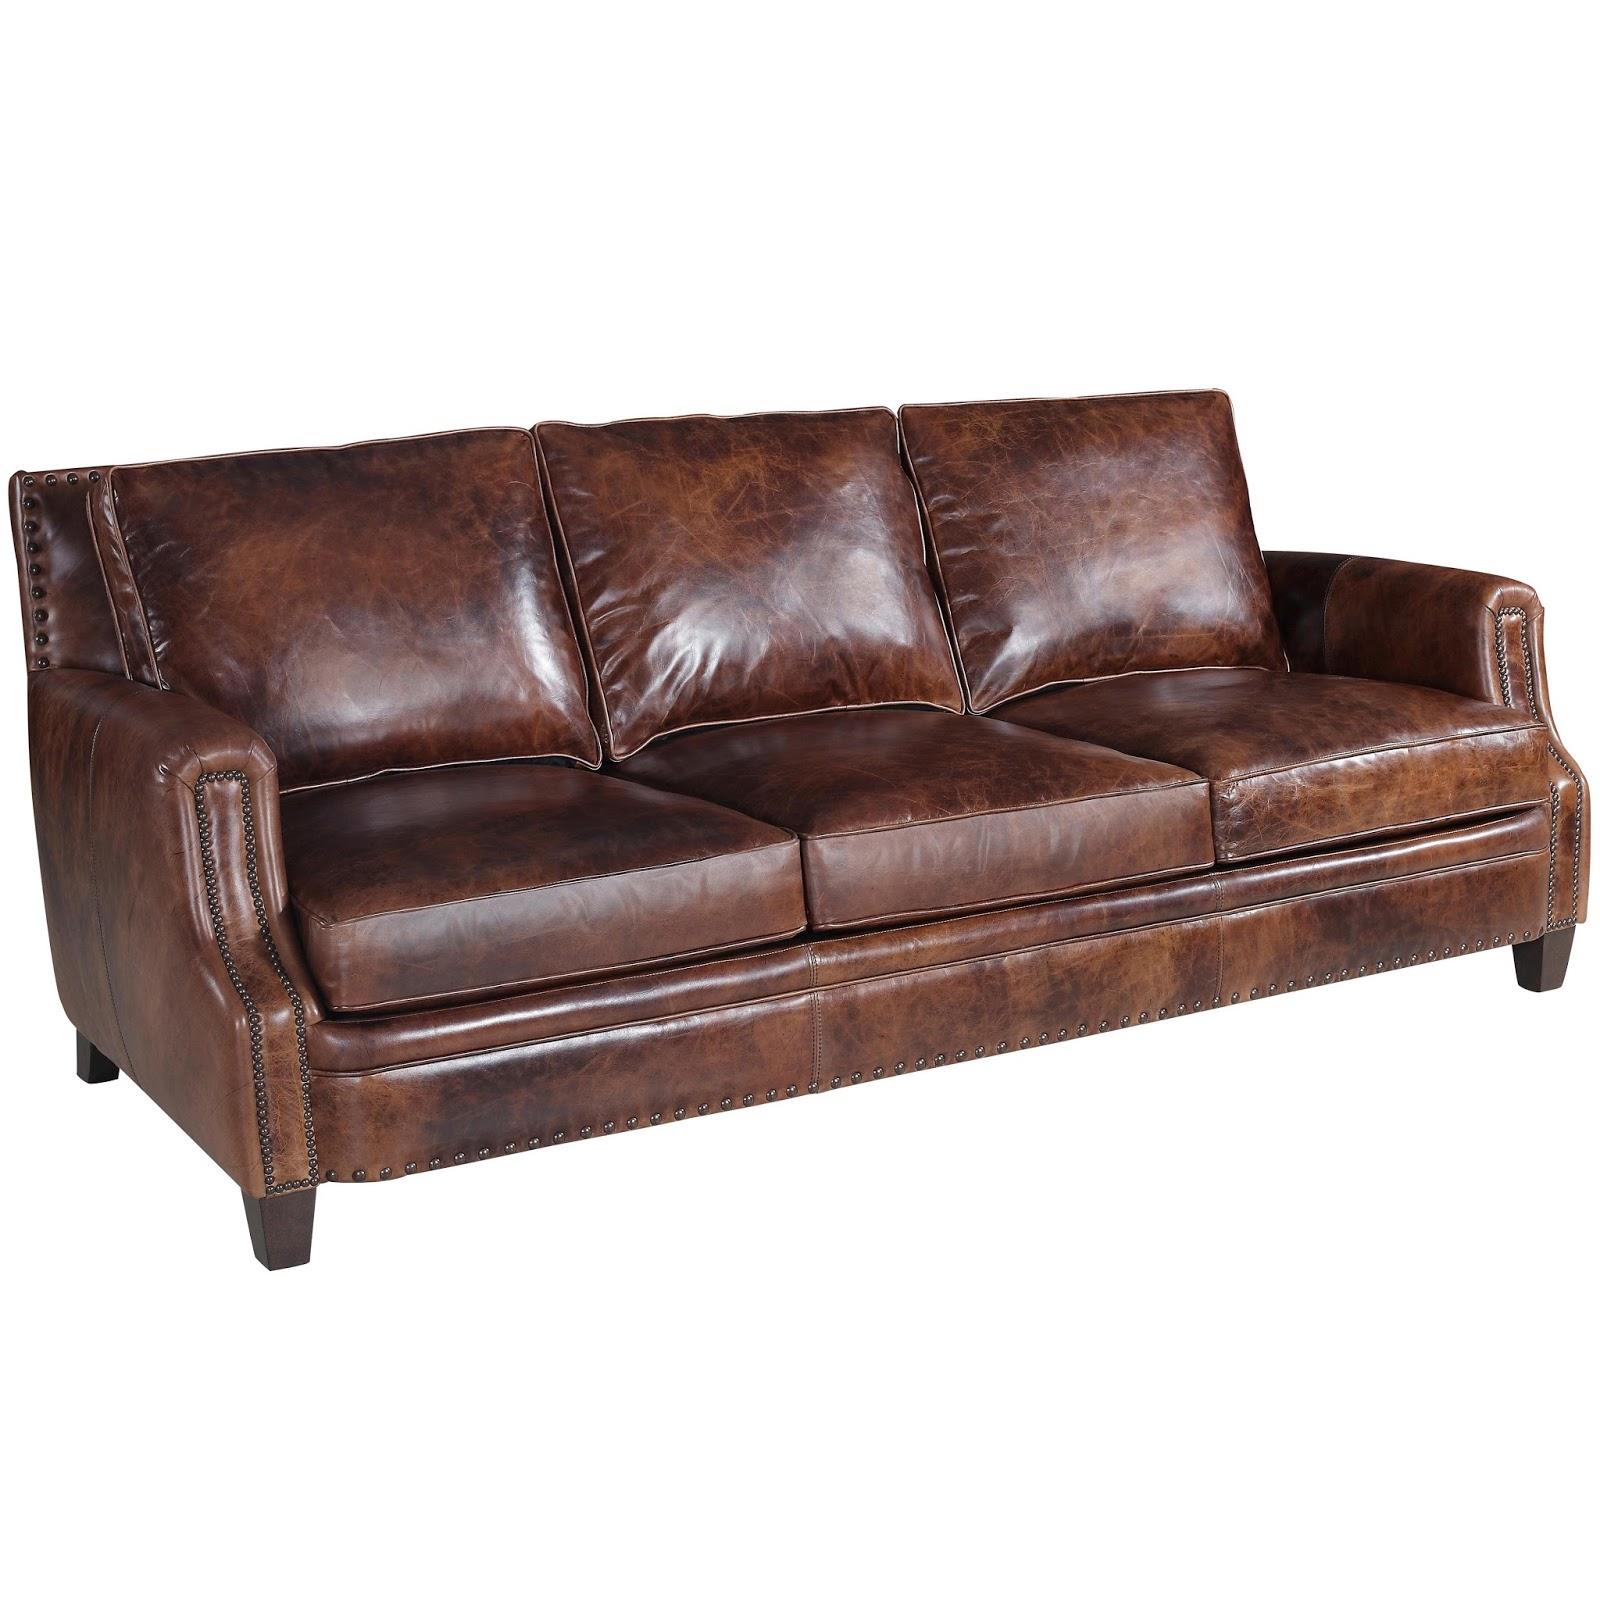 Baer S Furniture Store Leather Furniture In Neutral